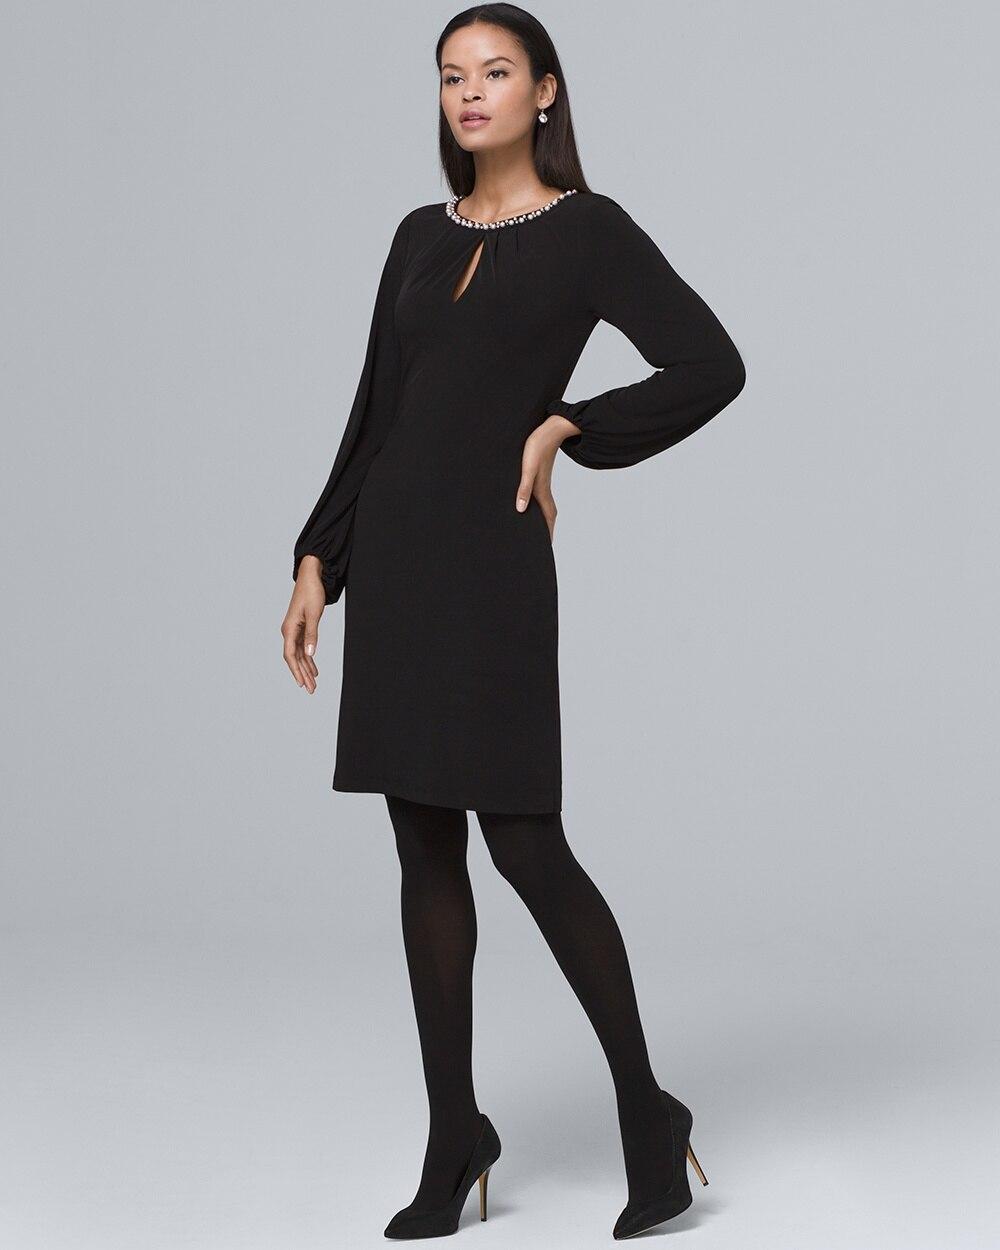 Black Shift Dress and Tights